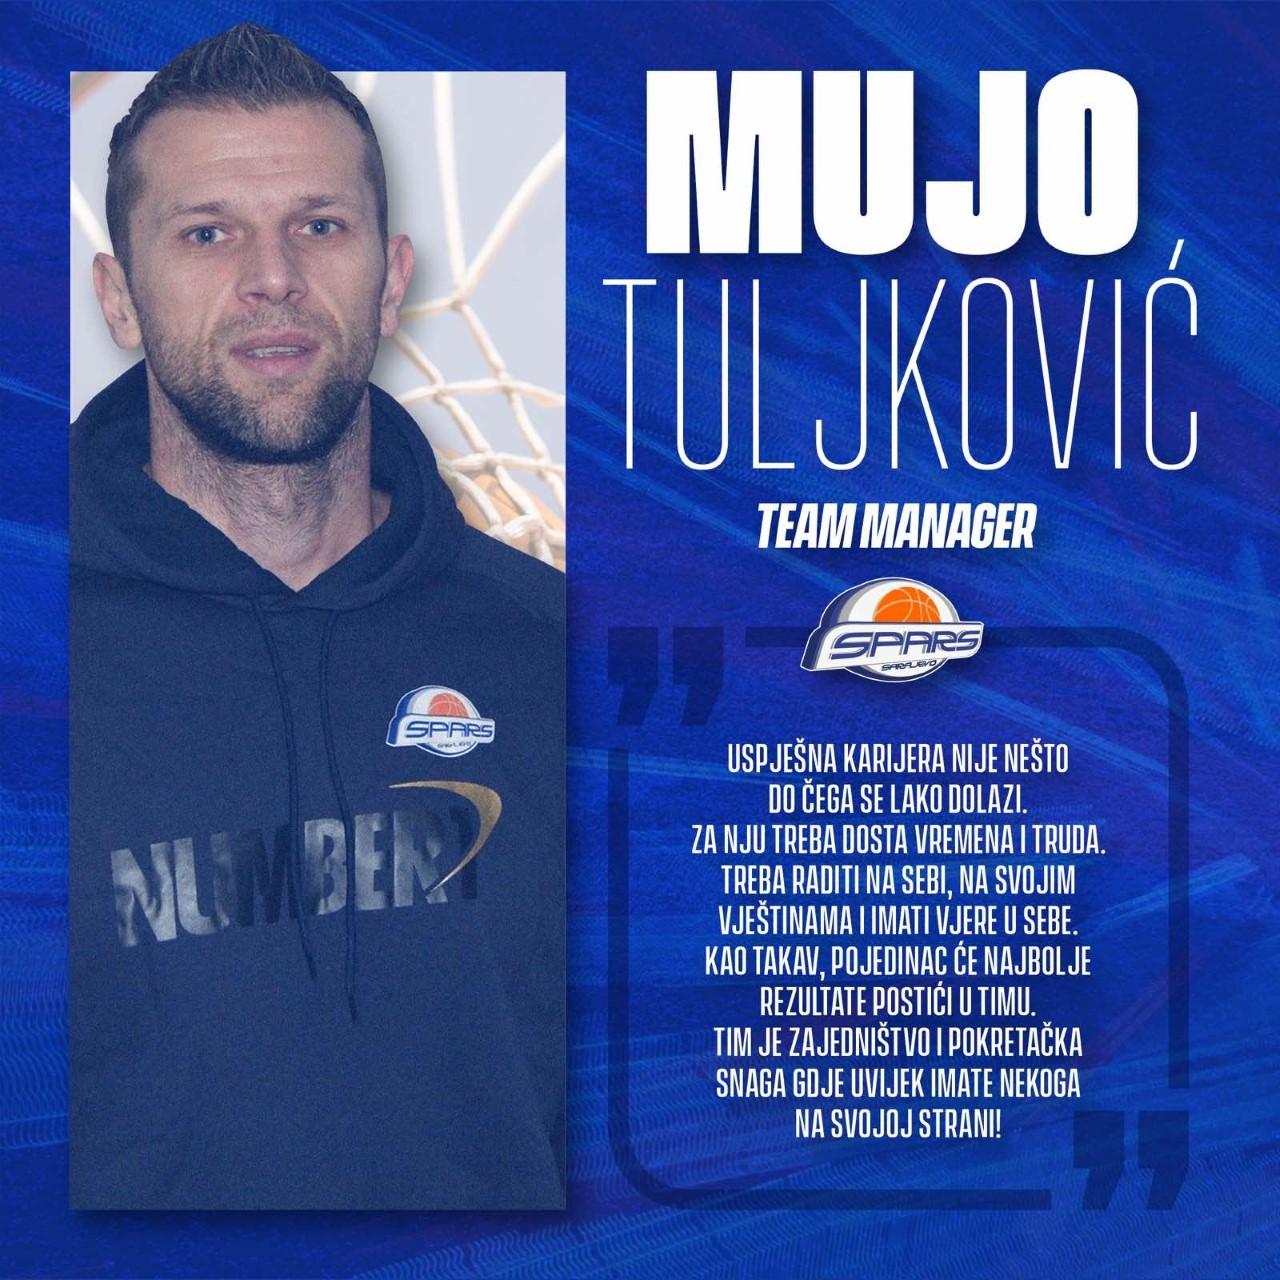 Mujo-Tuljkovic